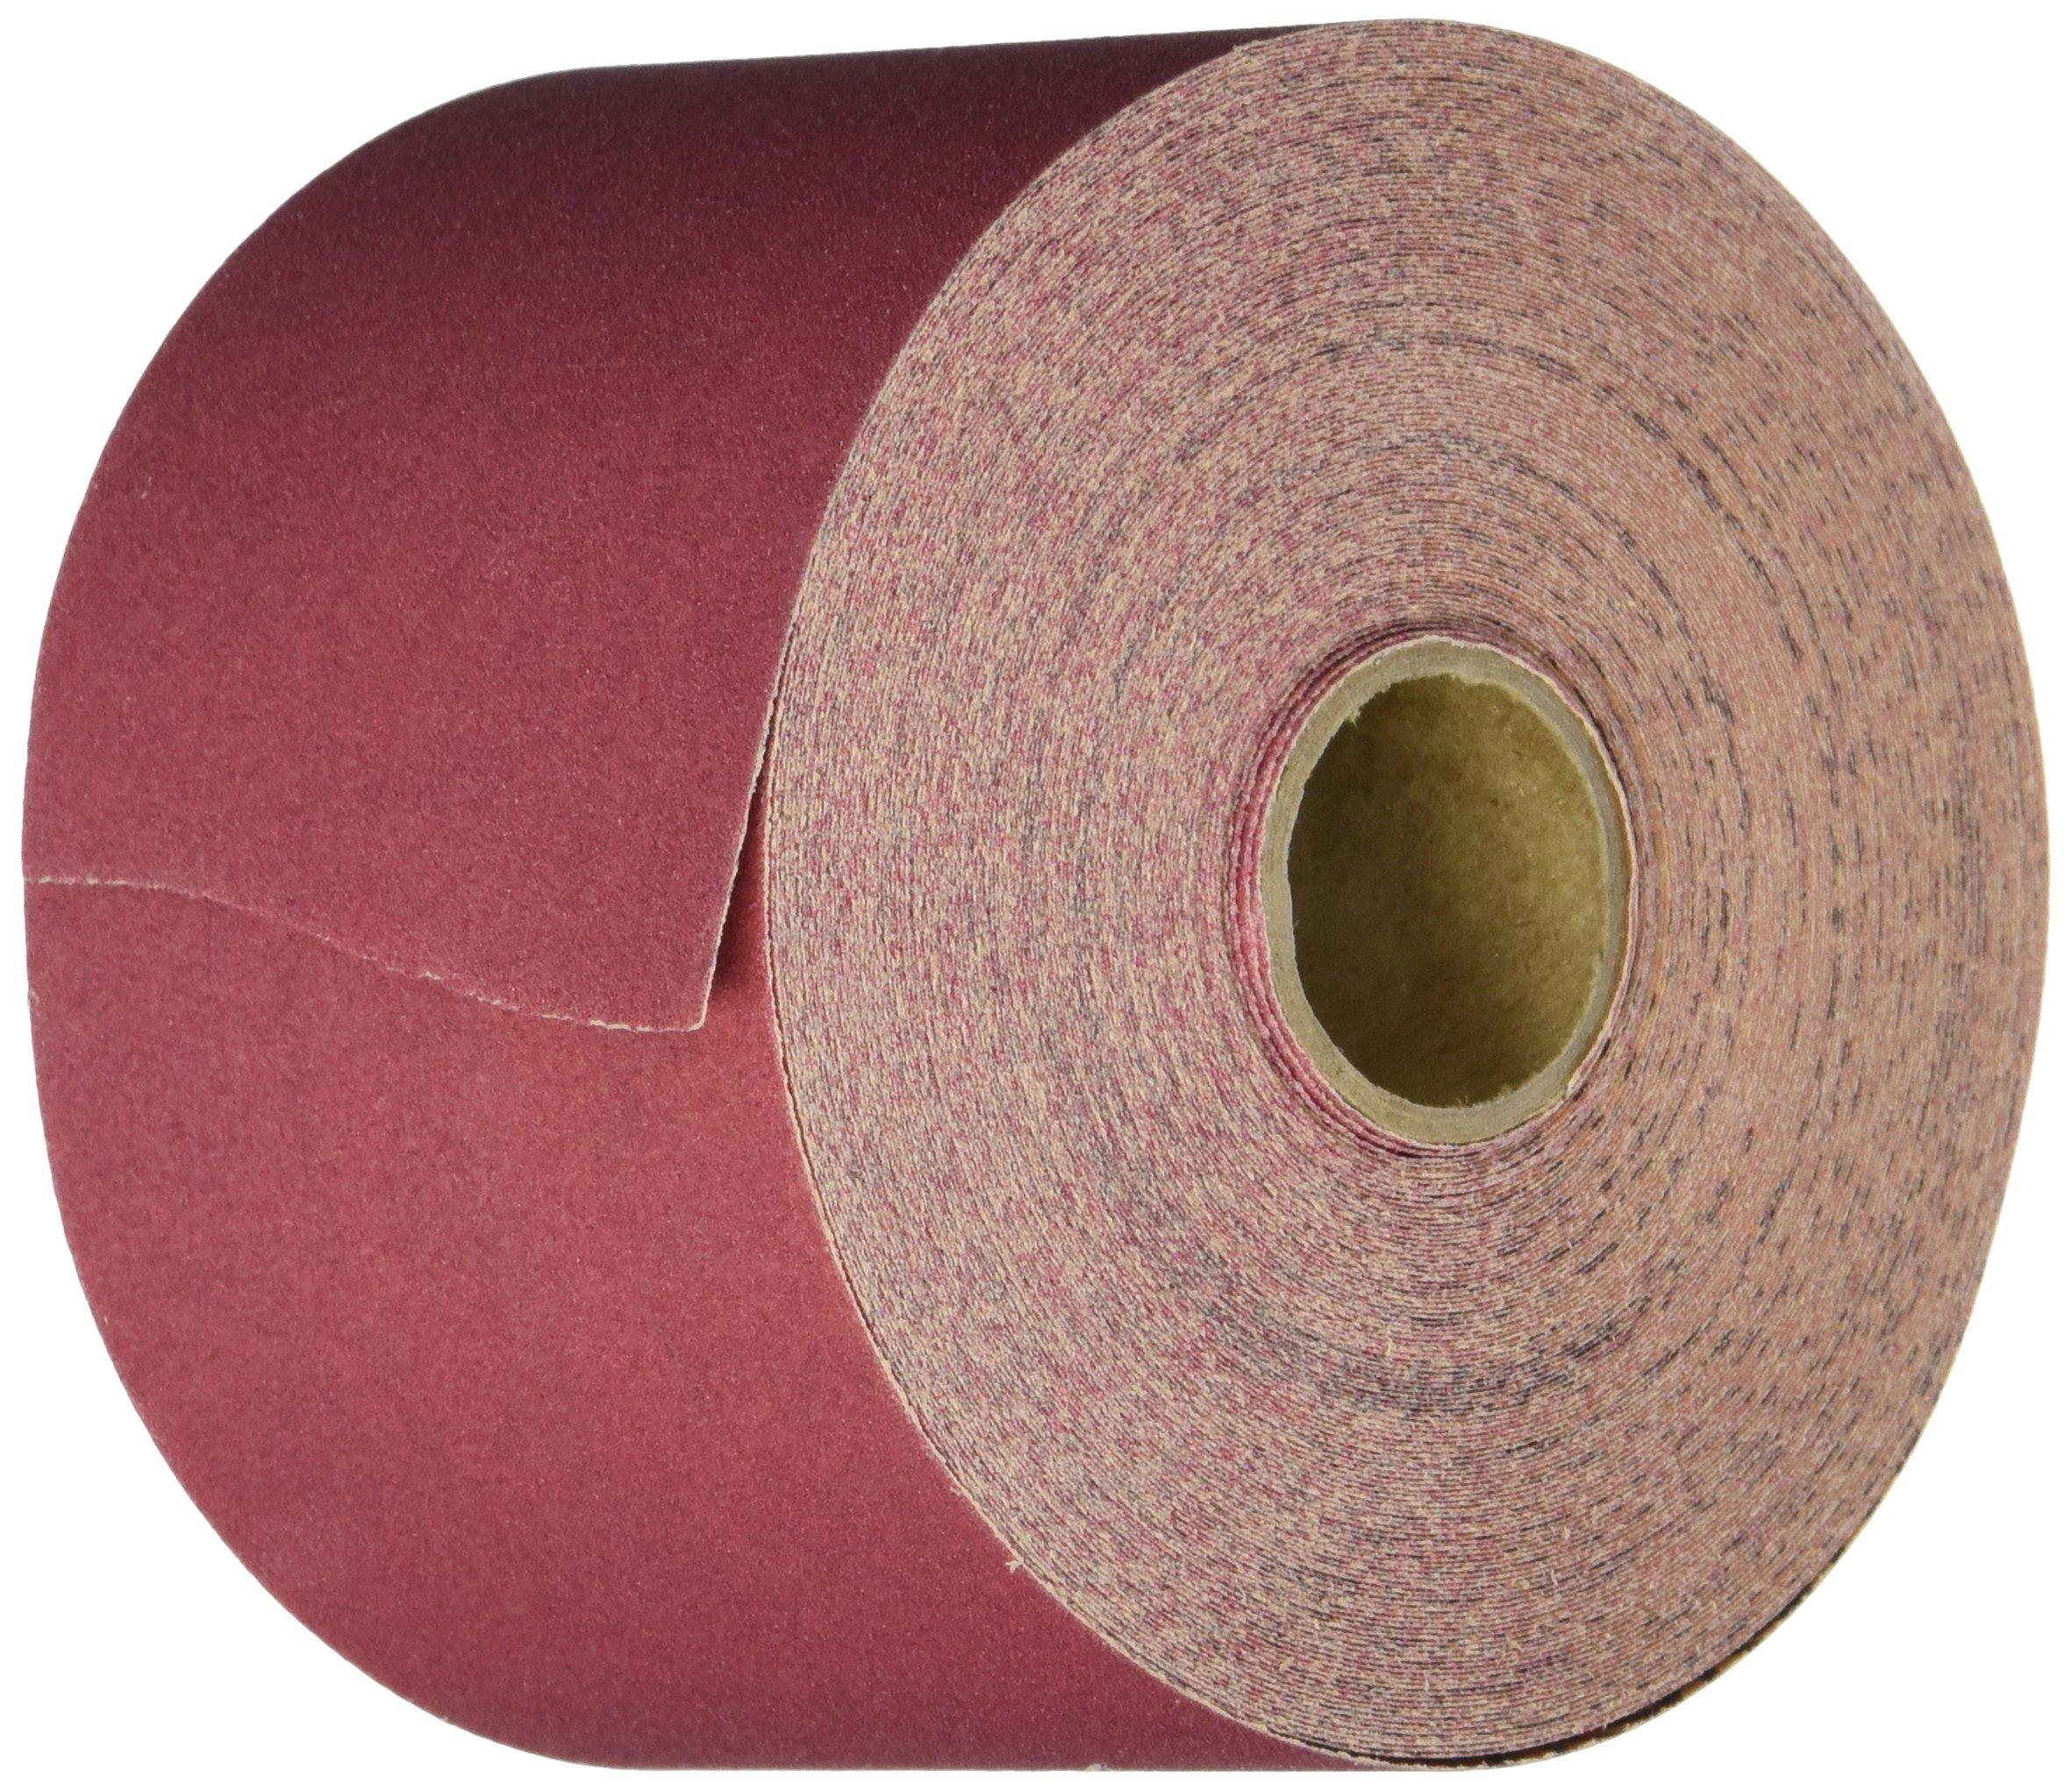 3M 01685 Stikit Red 2-3/4'' x 25 Yard P180 Grit Abrasive Sheet Roll by 3M